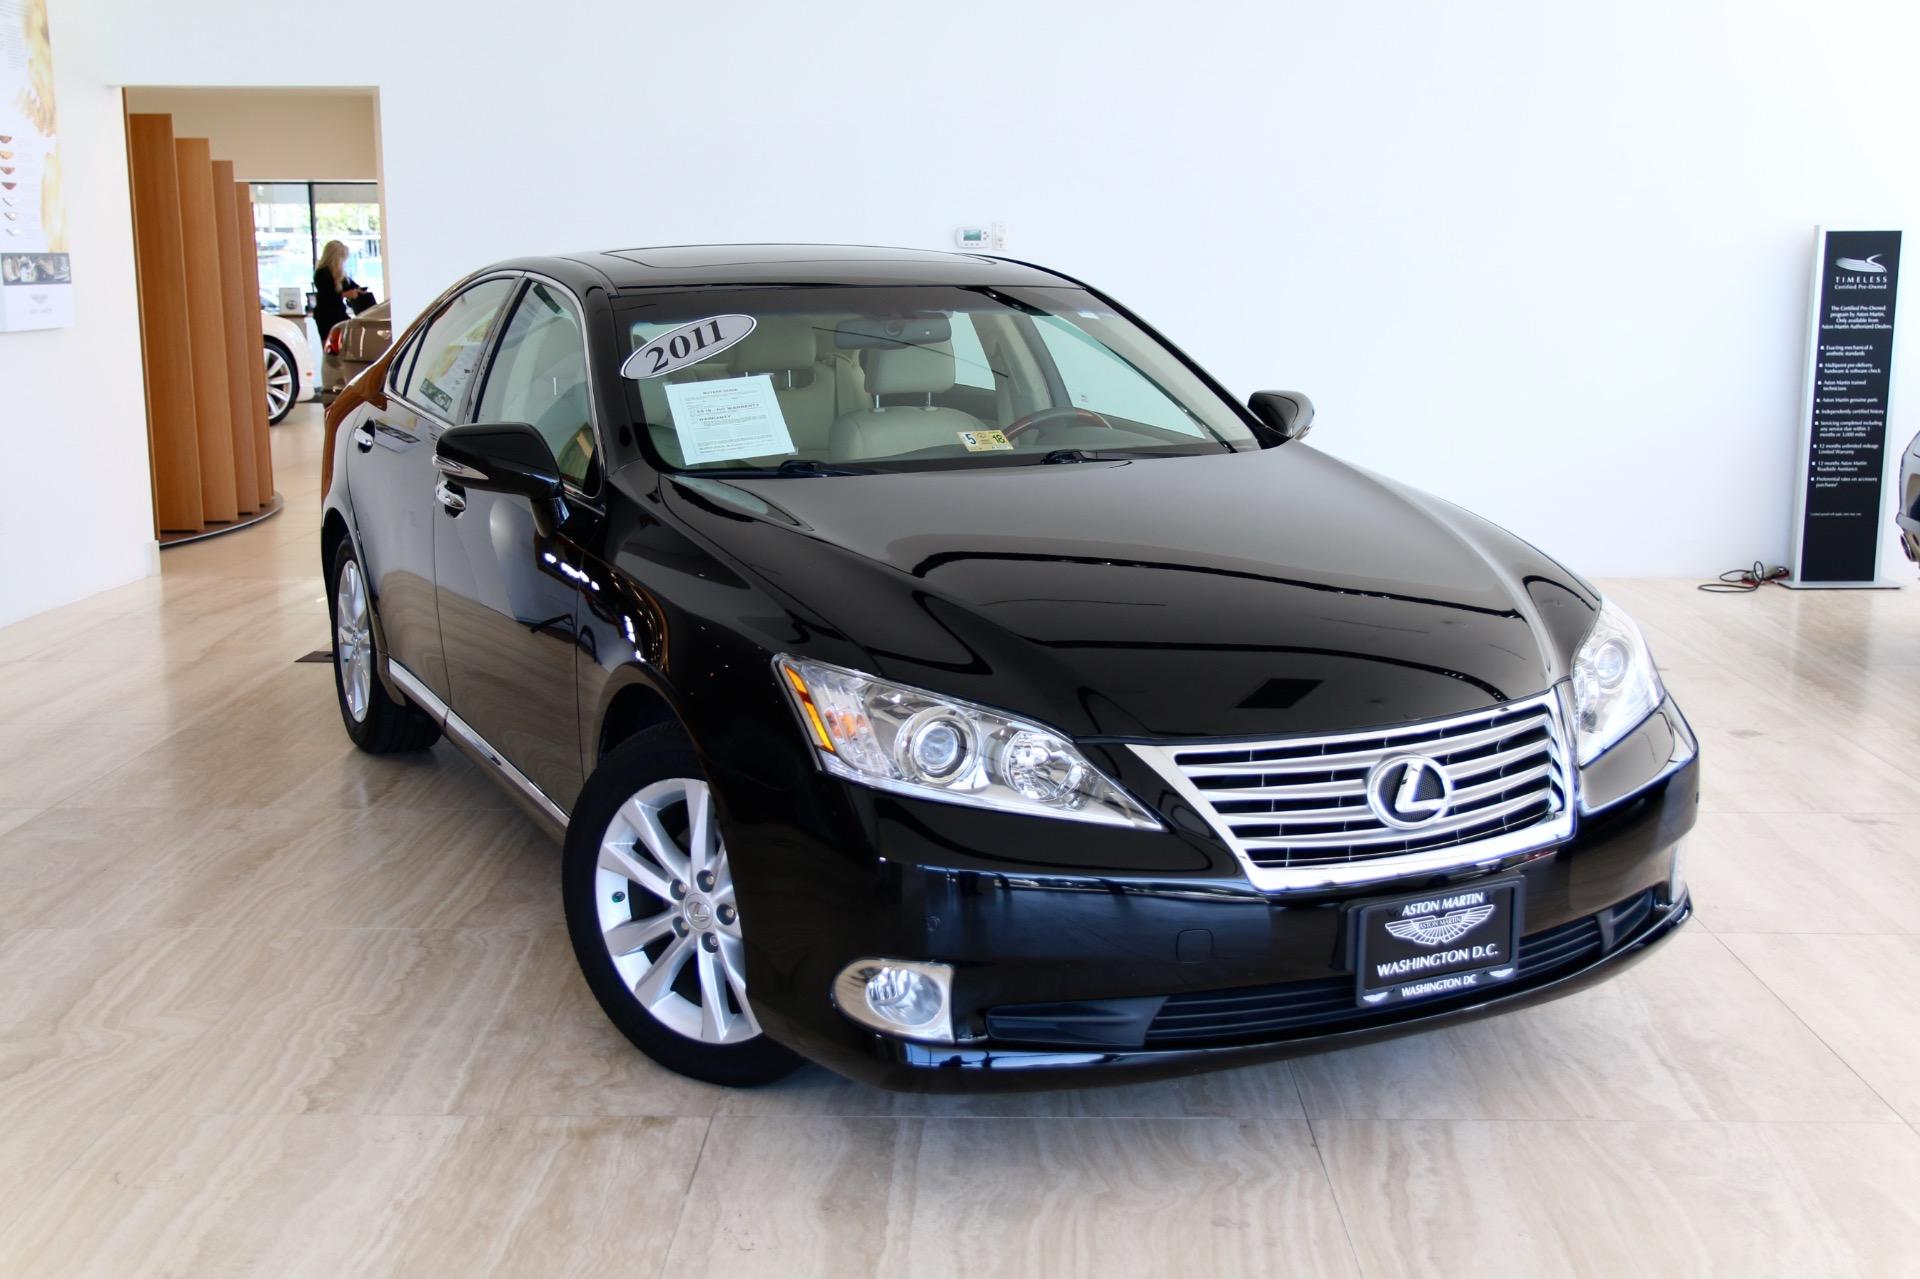 2011 Lexus ES 350 Stock P for sale near Vienna VA